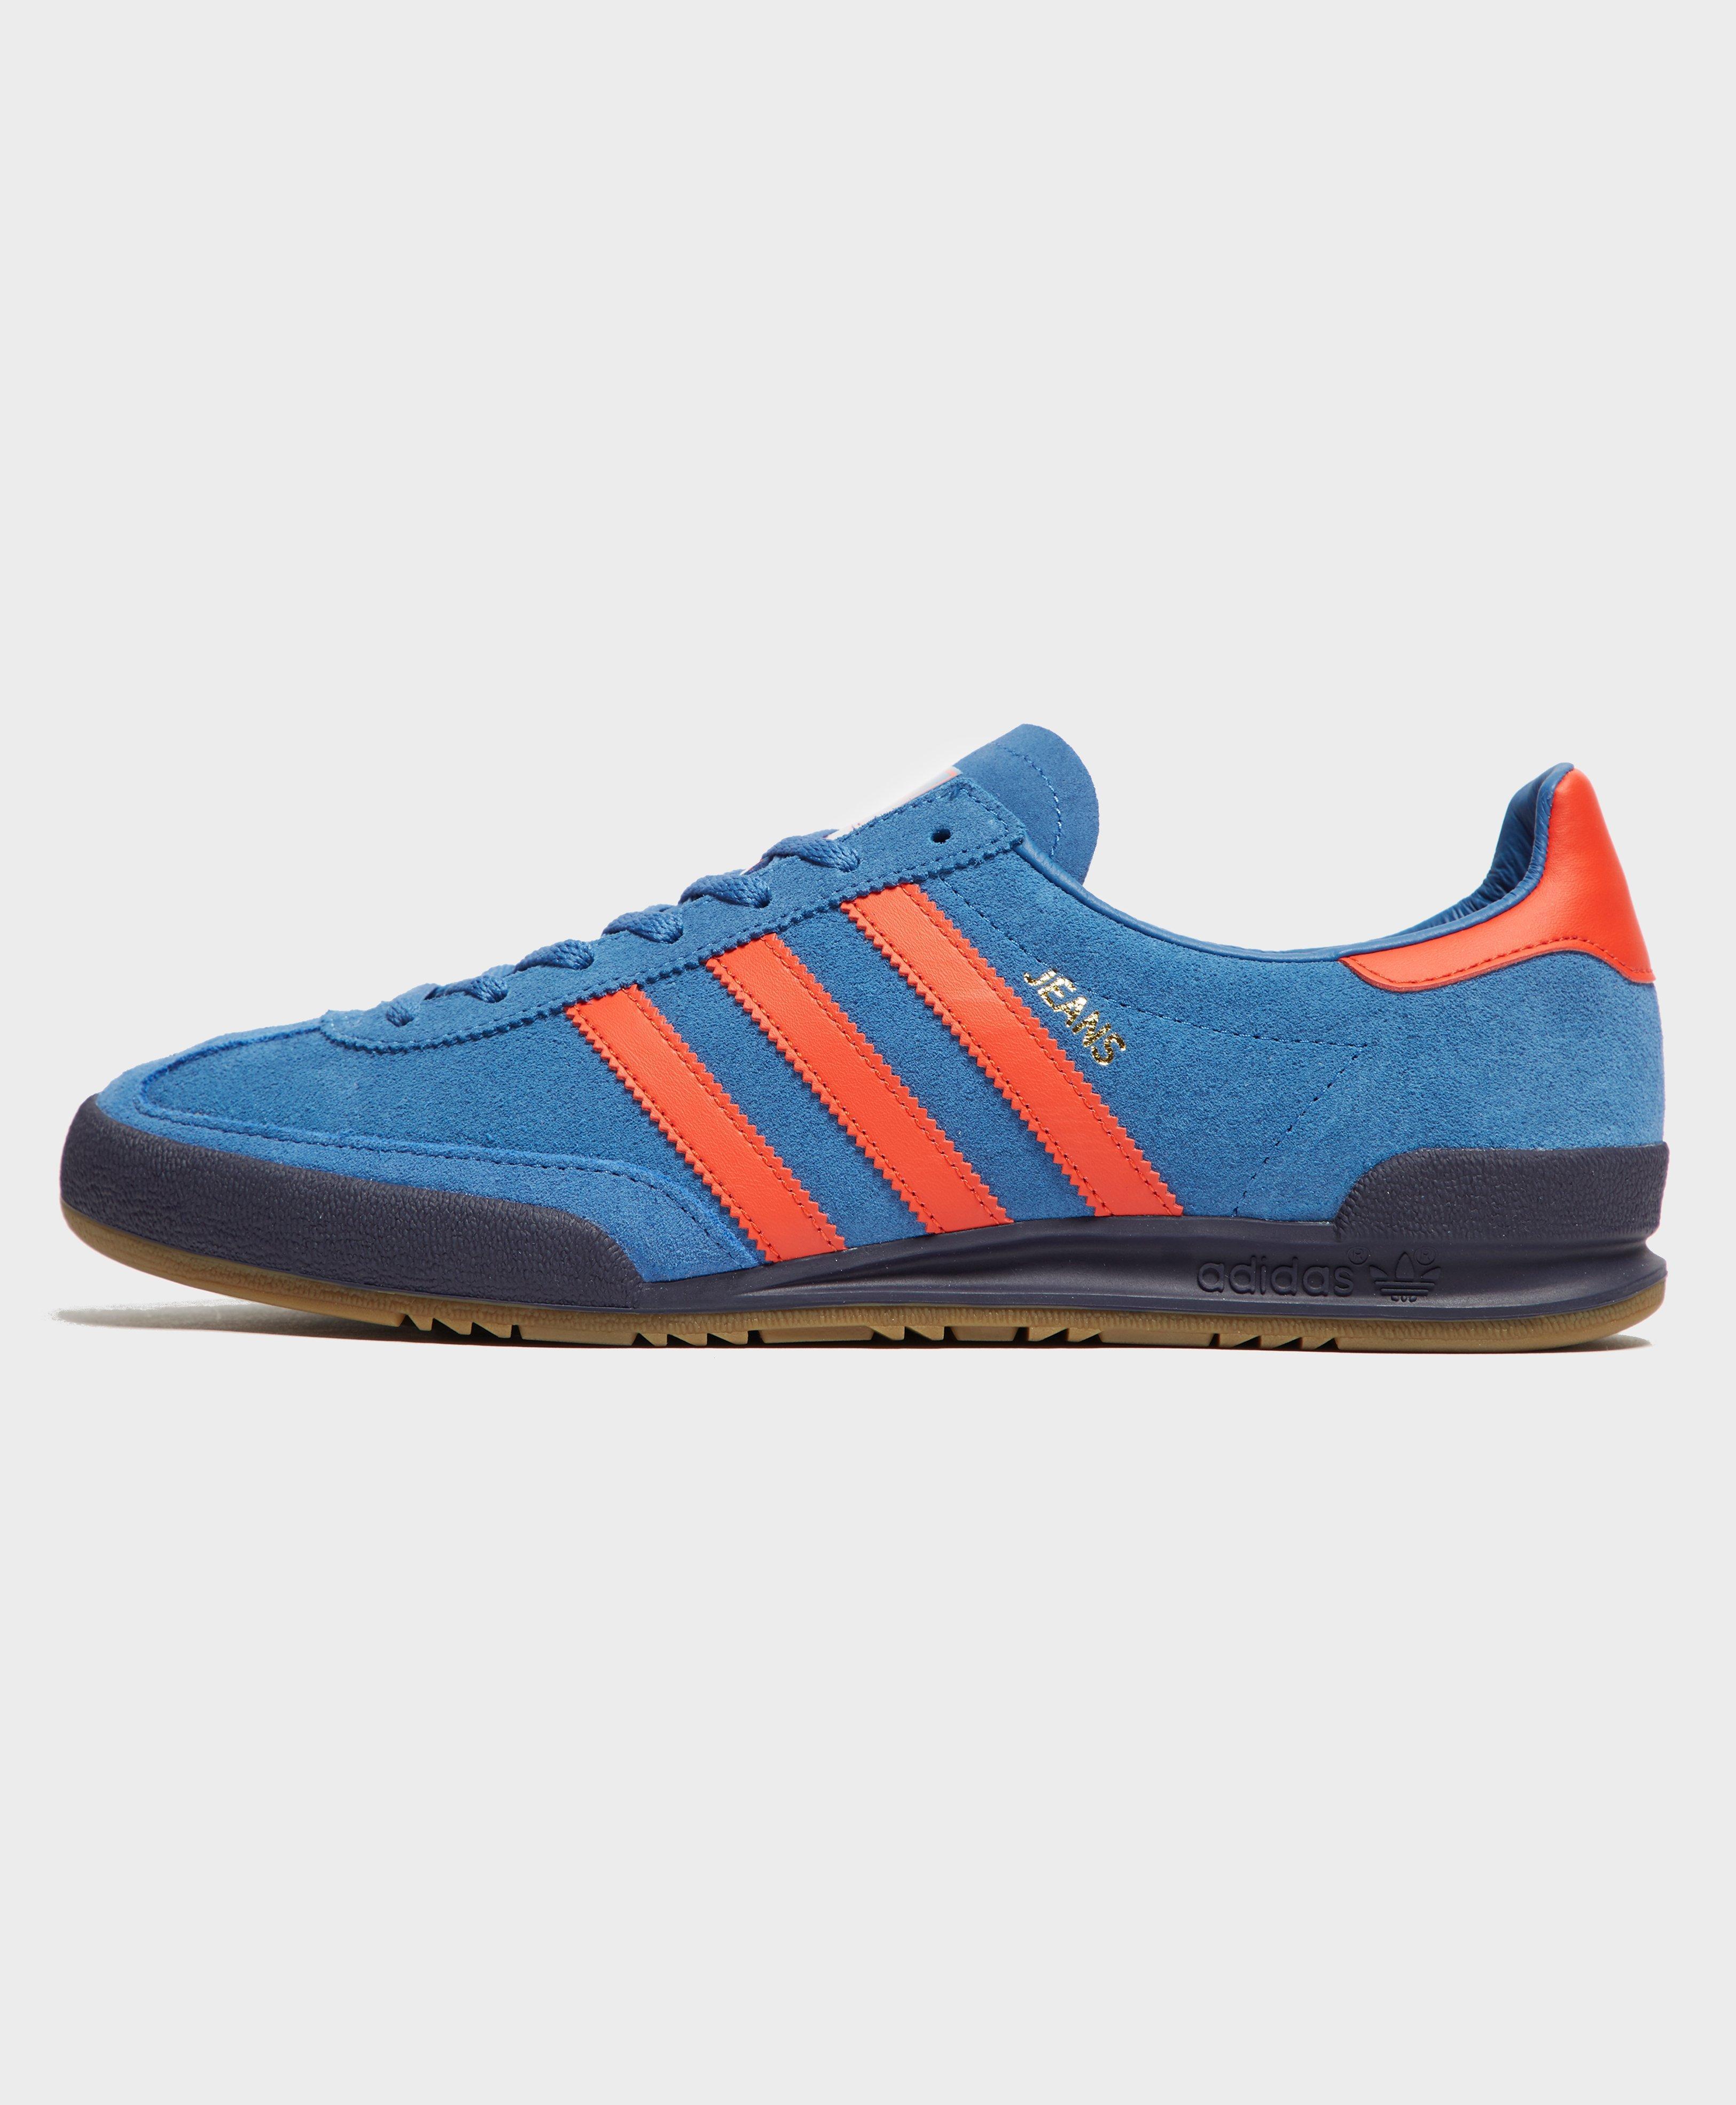 adidas boost size 12 adidas superstar men blue